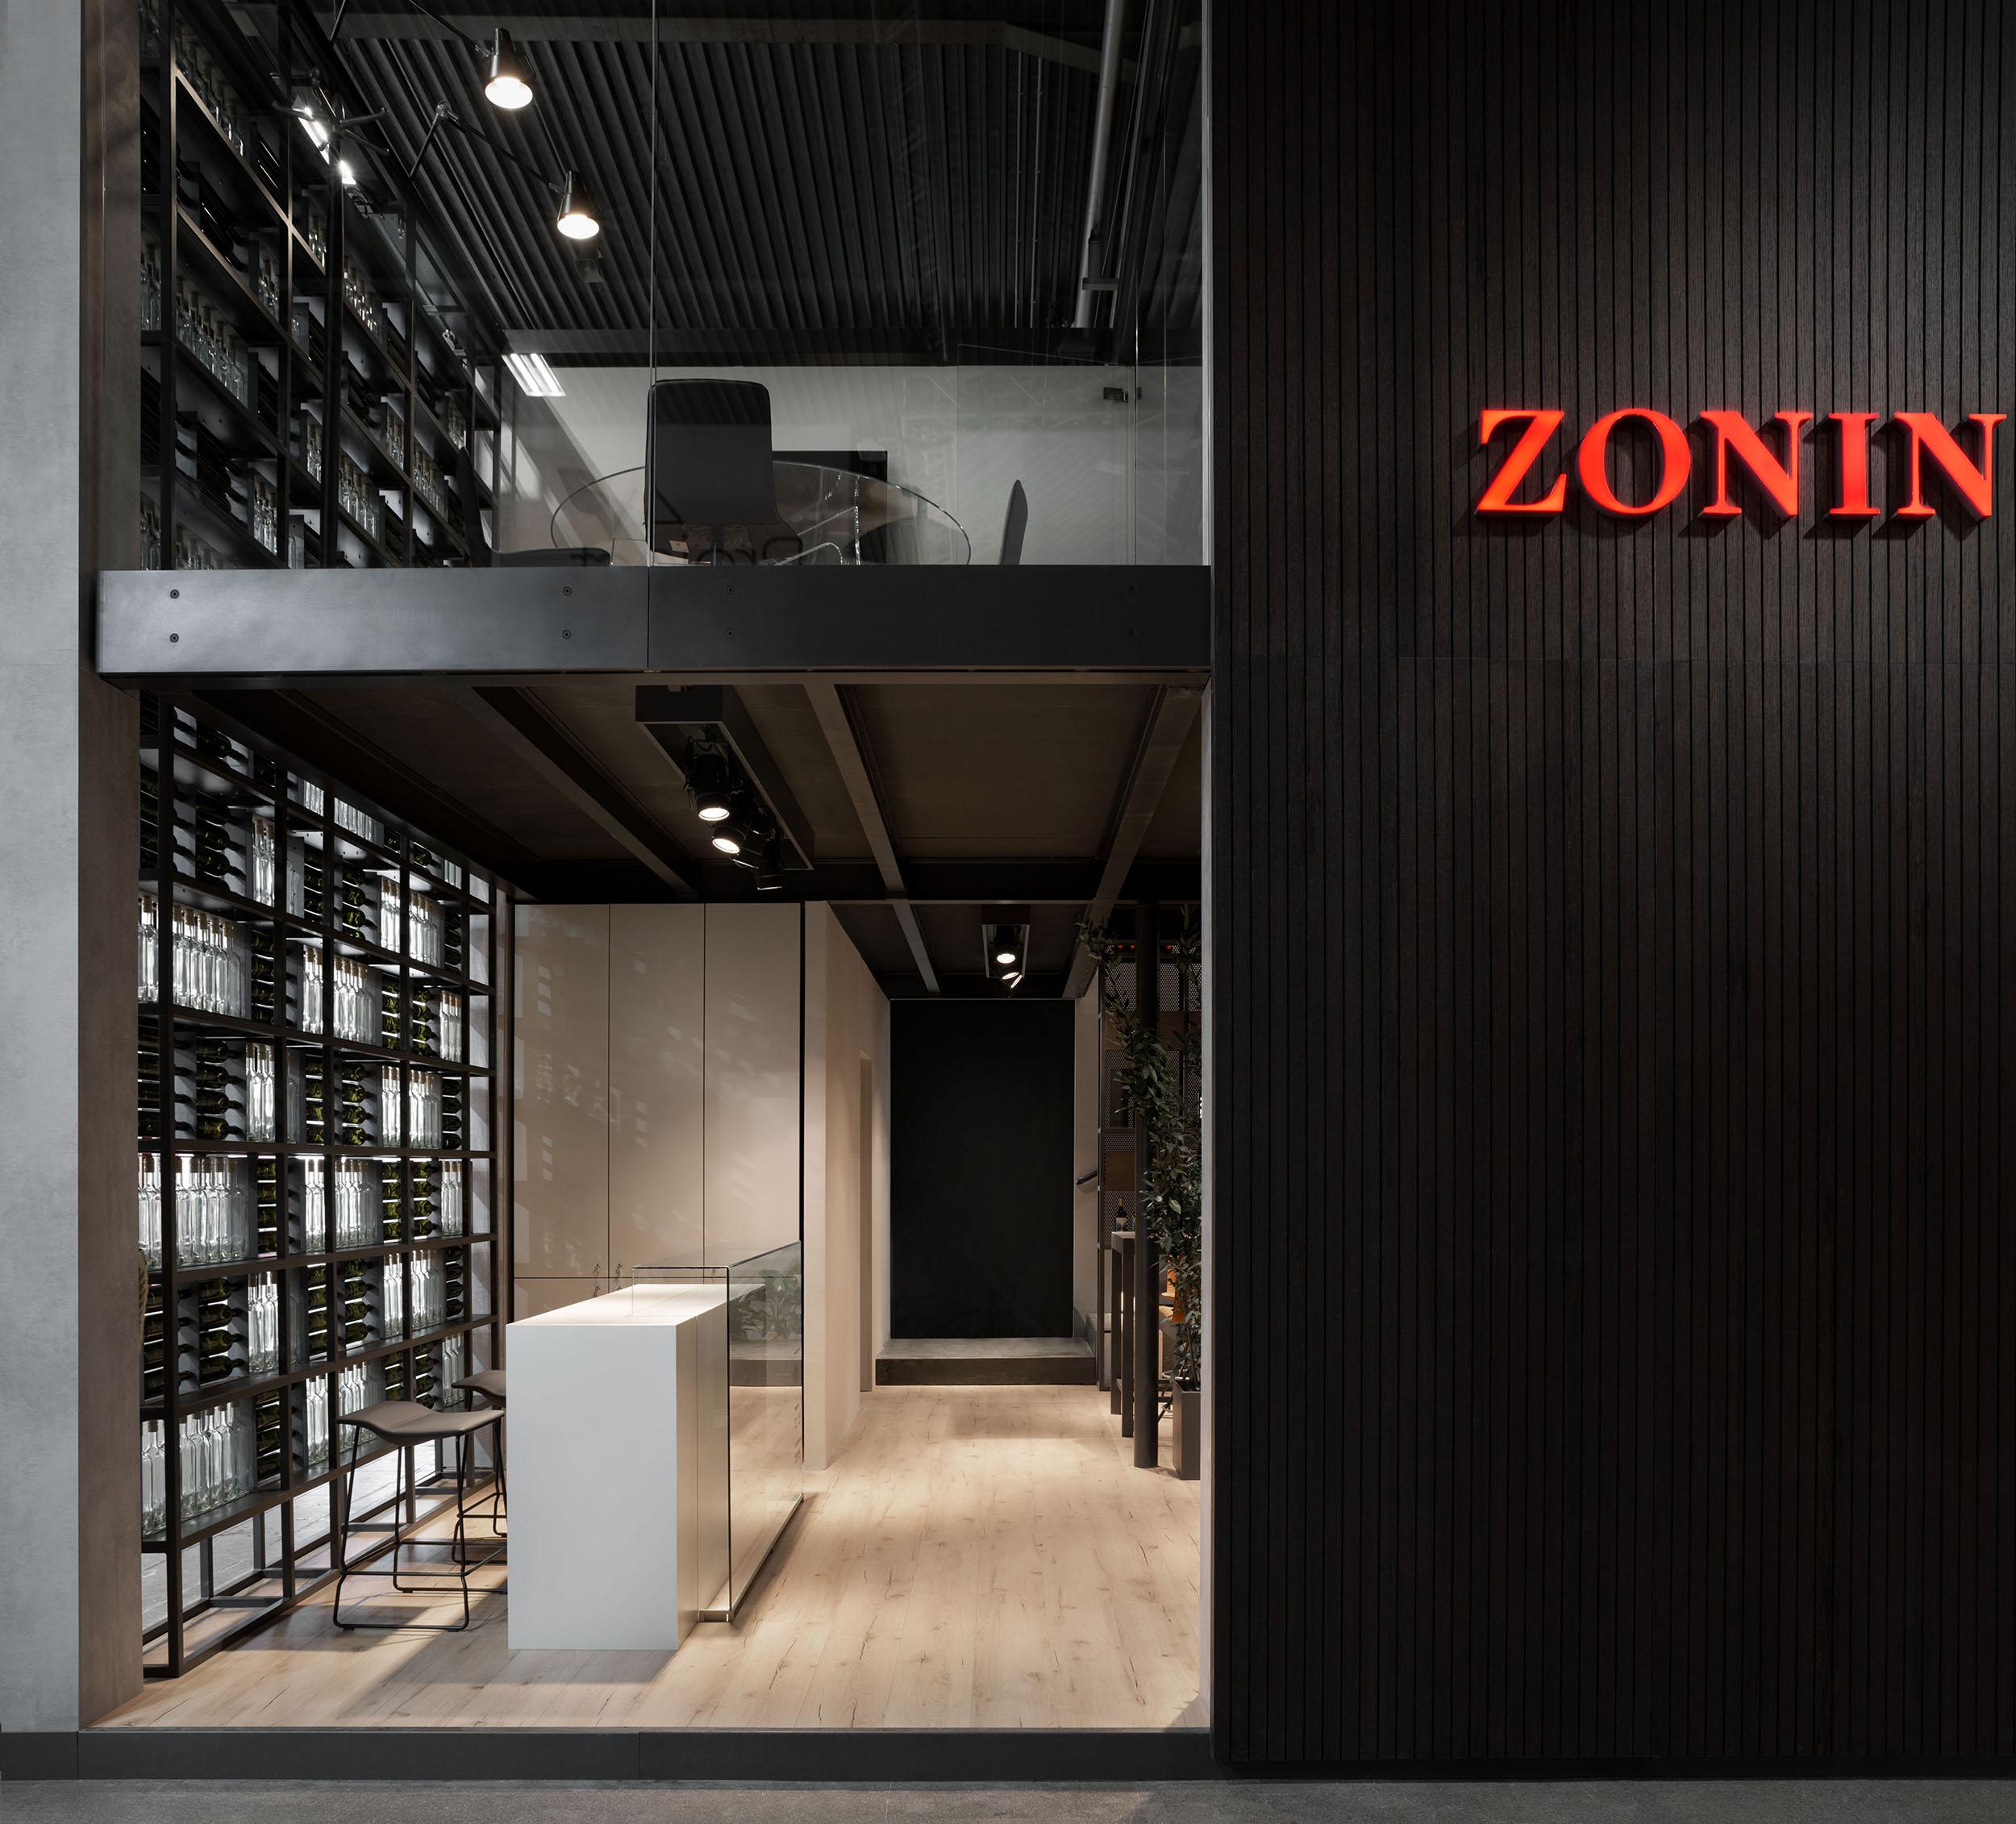 2019-Zonin1821-VinItaly_002